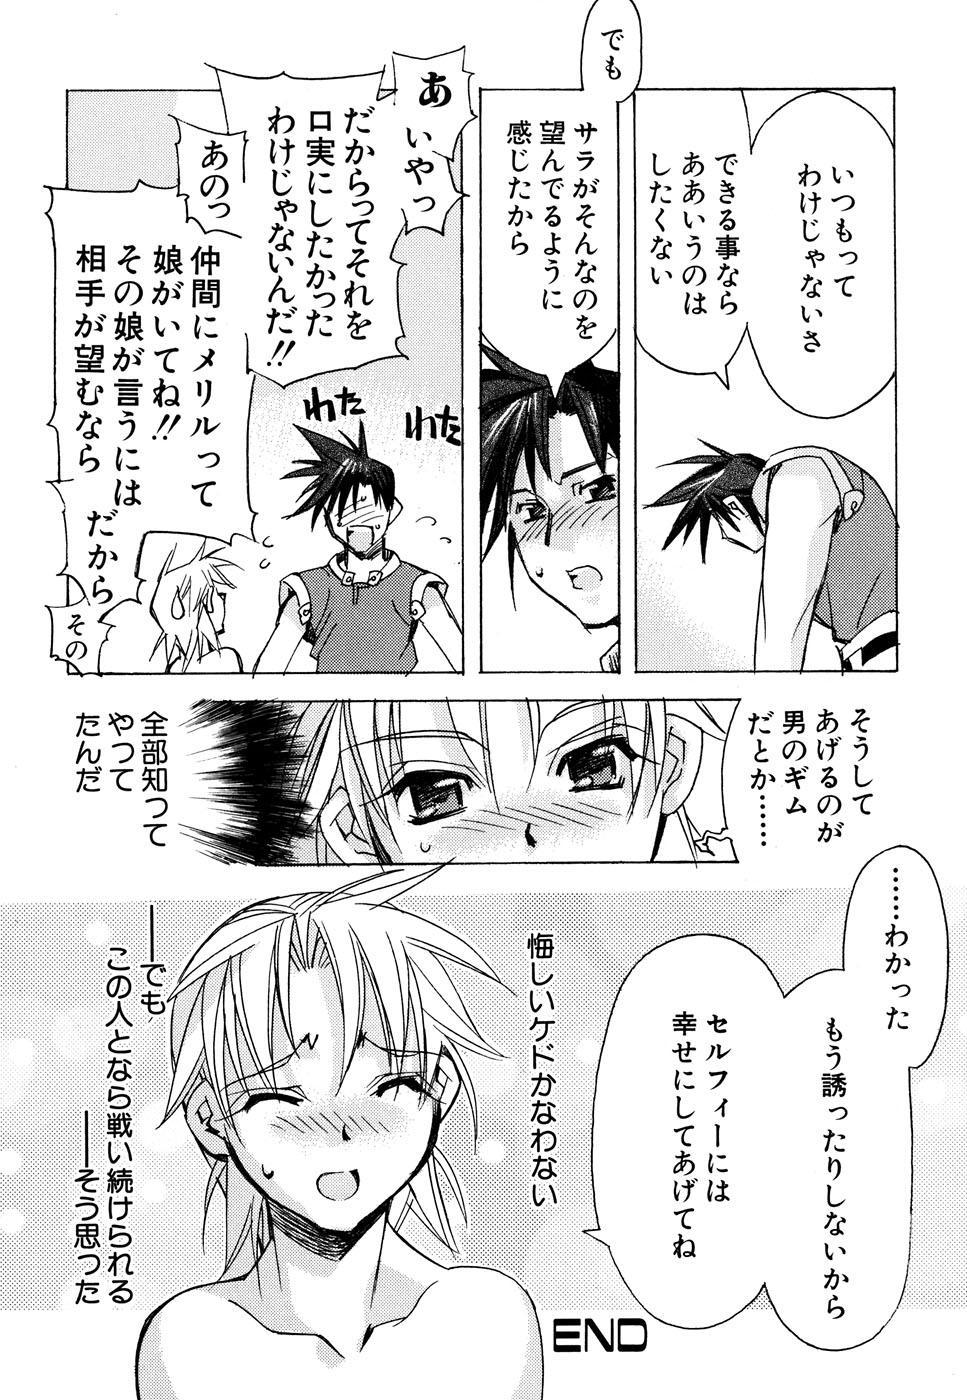 G-drive Vol.1 Ryoujokuhen 35